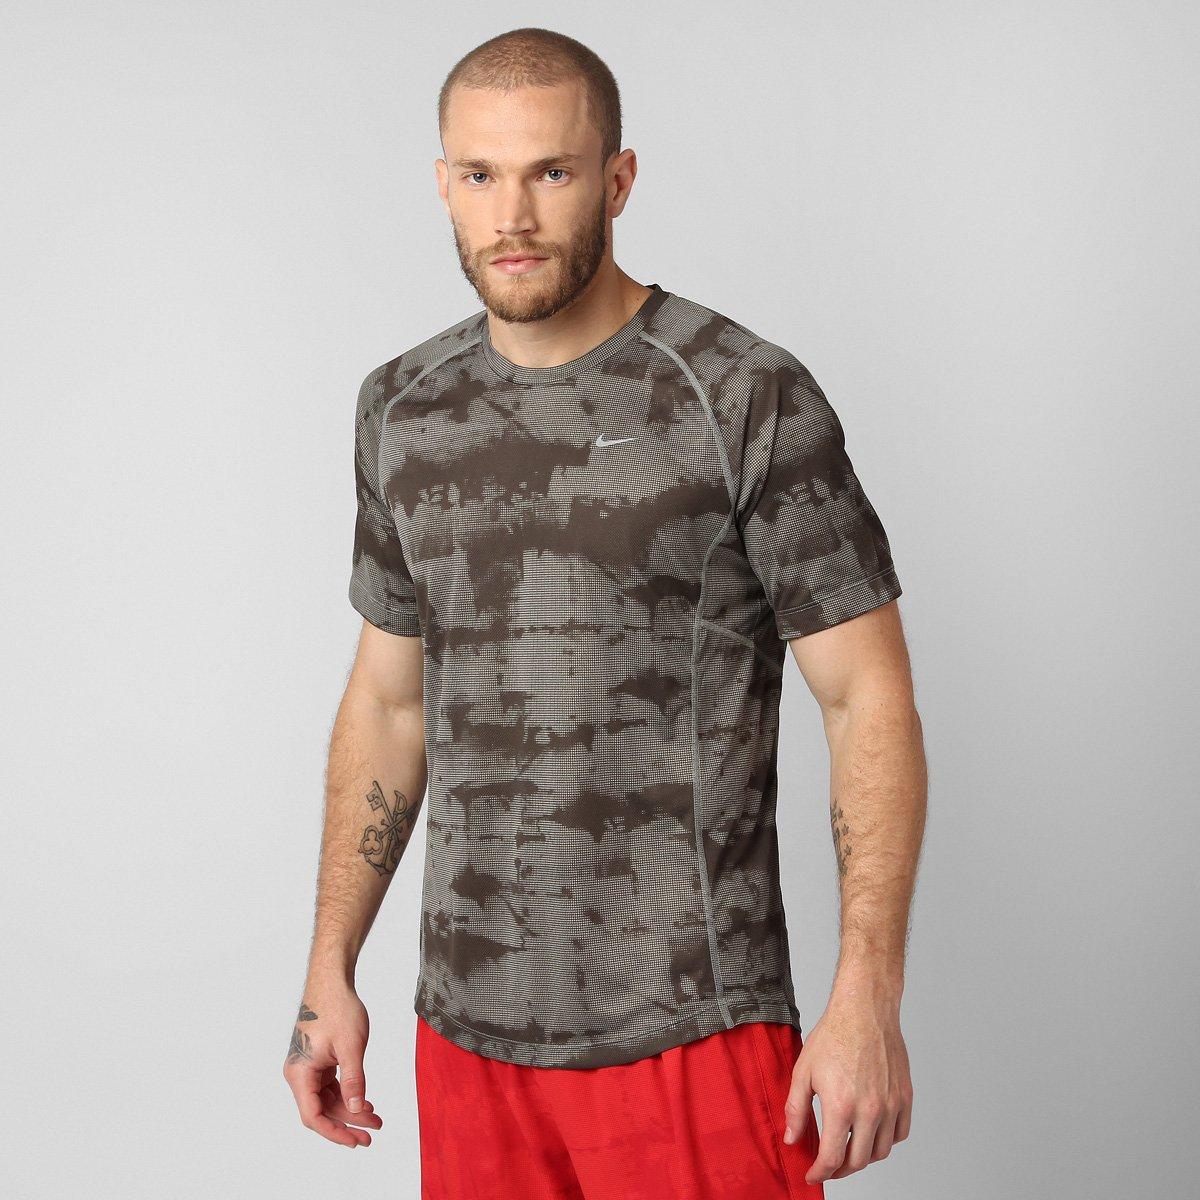 389dcdc330 Camiseta Nike Miler Graphic - Compre Agora